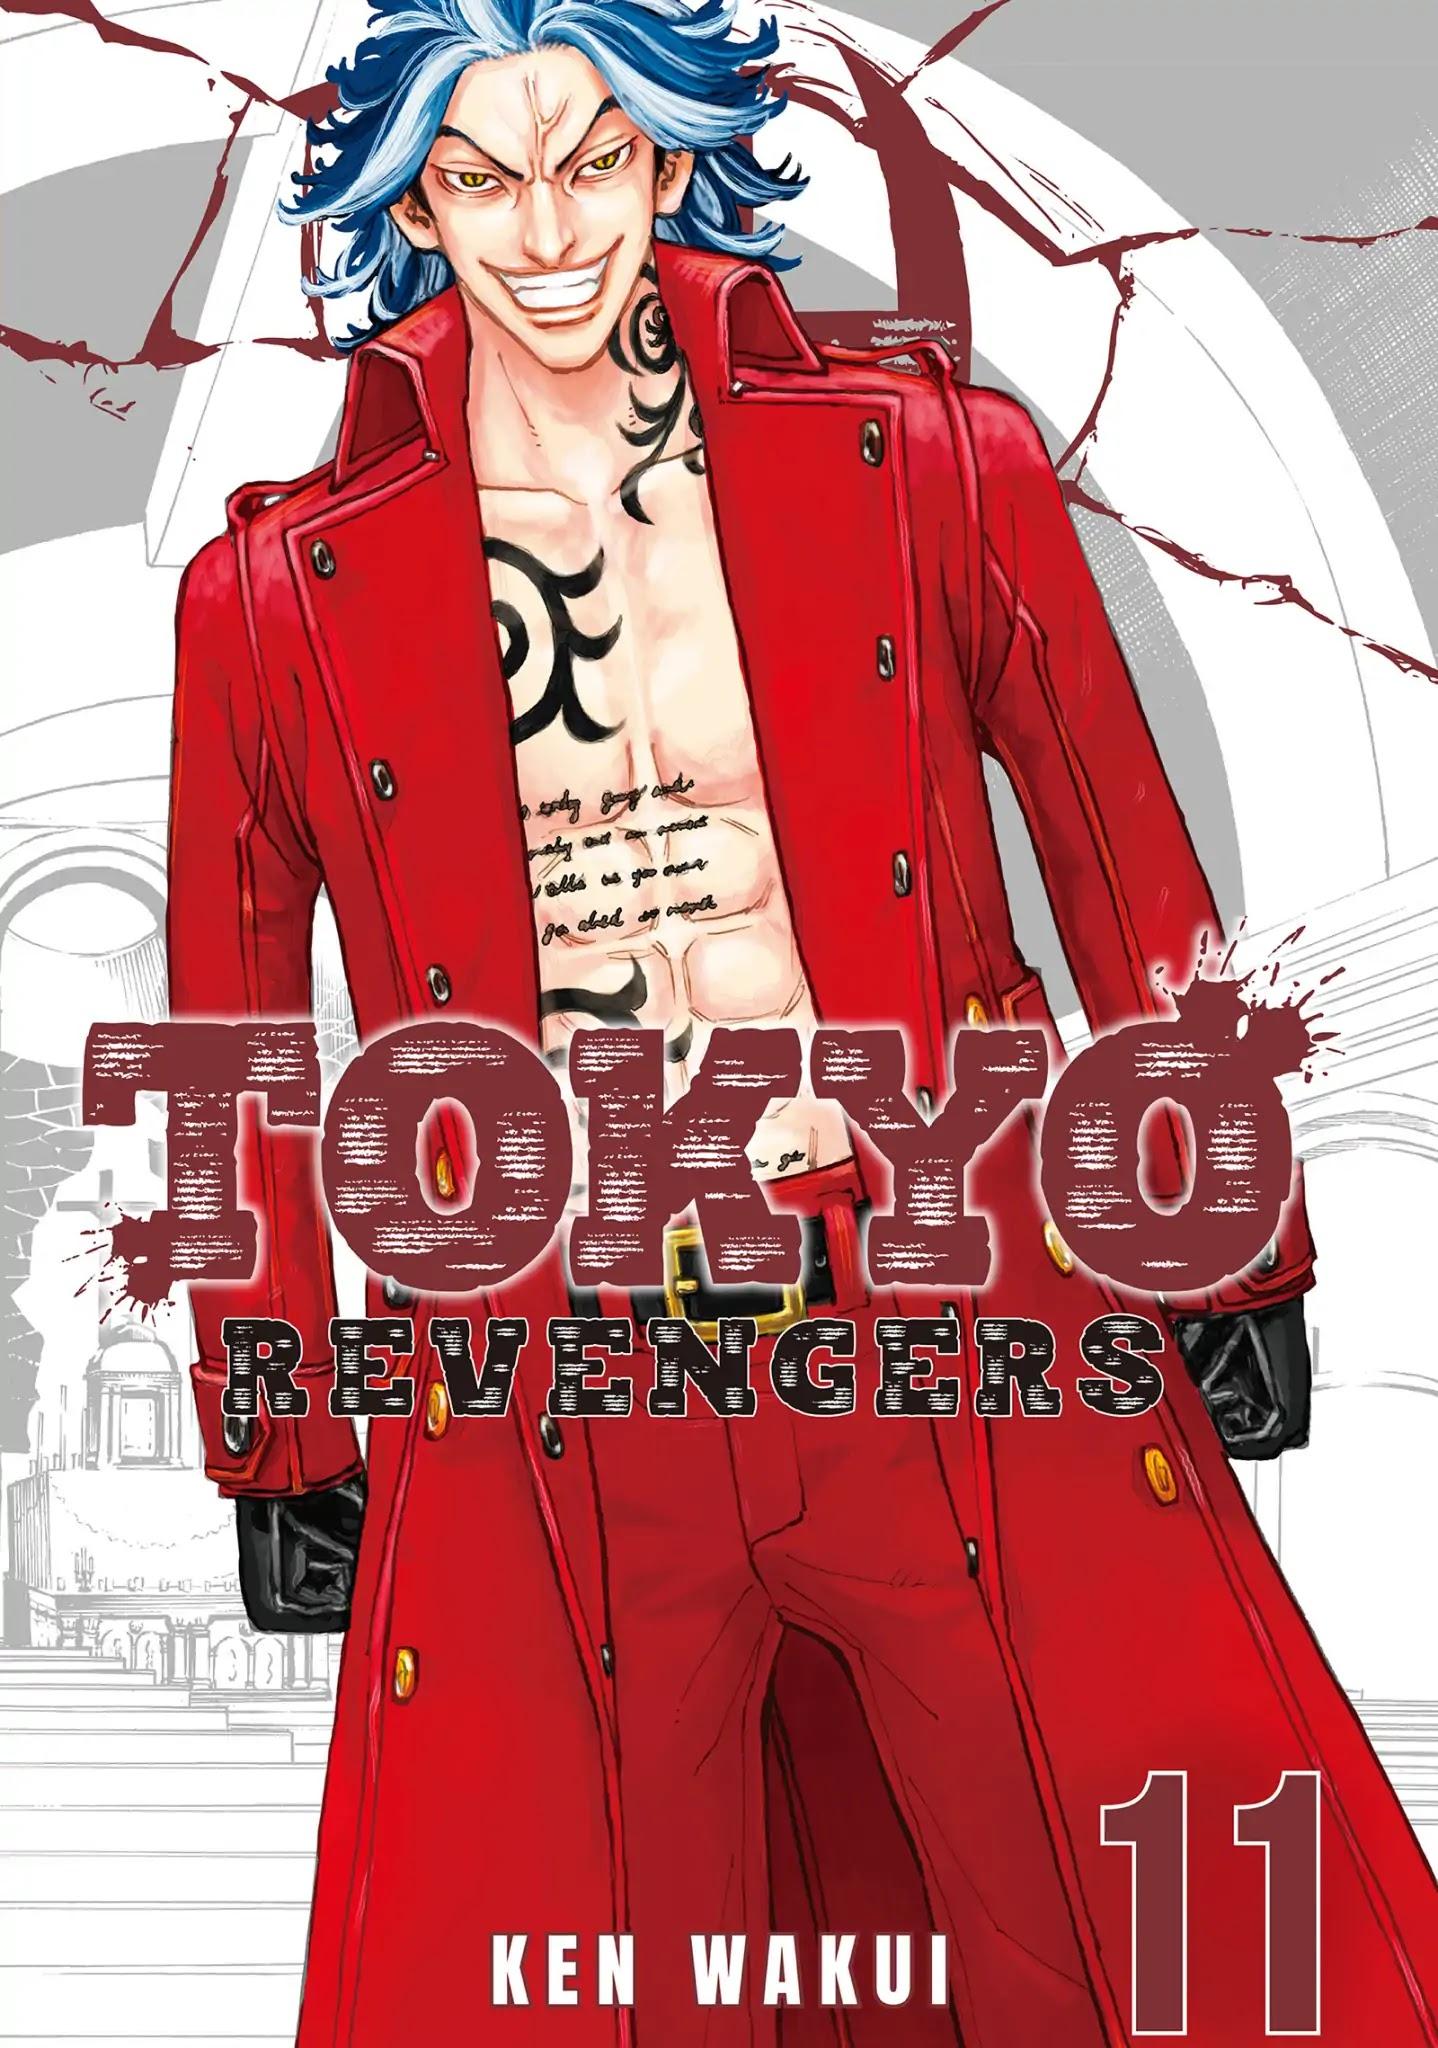 tokyo revengers characters, tokyo revengers live action, tokyo revengers mikey, tokyo revengers anime release date, tokyo revengers plot, tokyo revengers myanimelist, tokyo revengers kisaki, tokyo revengers takemichi, tokyo revengers draken, mikey tokyo revengers, kisaki tokyo revengers, draken tokyo revengers, kazutora tokyo revengers, takemichi tokyo revengers, baji tokyo revengers, izana tokyo revengers, emma tokyo revengers, tokyo manji revengers, tokyo manji revengers wiki, tokyo revengers wiki, watch tokyo revengers, tokyo revengers mal, tokyo revengers movie, nonton tokyo revengers, tokyo revengers anime studio, tokyo revengers ending, tokyo revengers anime, tokyo revengers anime episode 1, tokyo revengers arcs, tokyo revengers author, tokyo revengers about, tokyo revengers anime adaptation, tokyo revengers anime ep 1, tokyo revengers air date, tokyo revengers baji, tokyo revengers baka, tokyo revengers baji death, tokyo revengers black dragons, tokyo revengers best panels, tokyo revengers box set, tokyo revengers birthdays, tokyo revengers batch, tokyo revengers buy, tokyo revengers bl, tokyo revengers cast, tokyo revengers crunchyroll, tokyo revengers cover, tokyo revengers colored, tokyo revengers characters anime, tokyo revengers completed, tokyo revengers countdown, tokyo revengers chifuyu matsuno, fond d'écran tokyo revengers, tokyo revengers drama, tokyo revengers deaths, tokyo revengers date, tokyo revengers description, tokyo revengers download, tokyo revengers dubbed, tokyo revengers date de sortie, tokyo revengers discord server, tokyo revengers deceased, tokyo revengers english print, tokyo revengers episodes, tokyo revengers episode 2, tokyo revengers earrings, tokyo revengers episode release date, tokyo revengers episode countdown, tokyo revengers episode 0 review, tokyo revengers episode 0 release date, tokyo revengers episode release, tokyo revengers fandom, tokyo revengers full movie, tokyo revengers final arc, tokyo revengers fanart, tokyo r